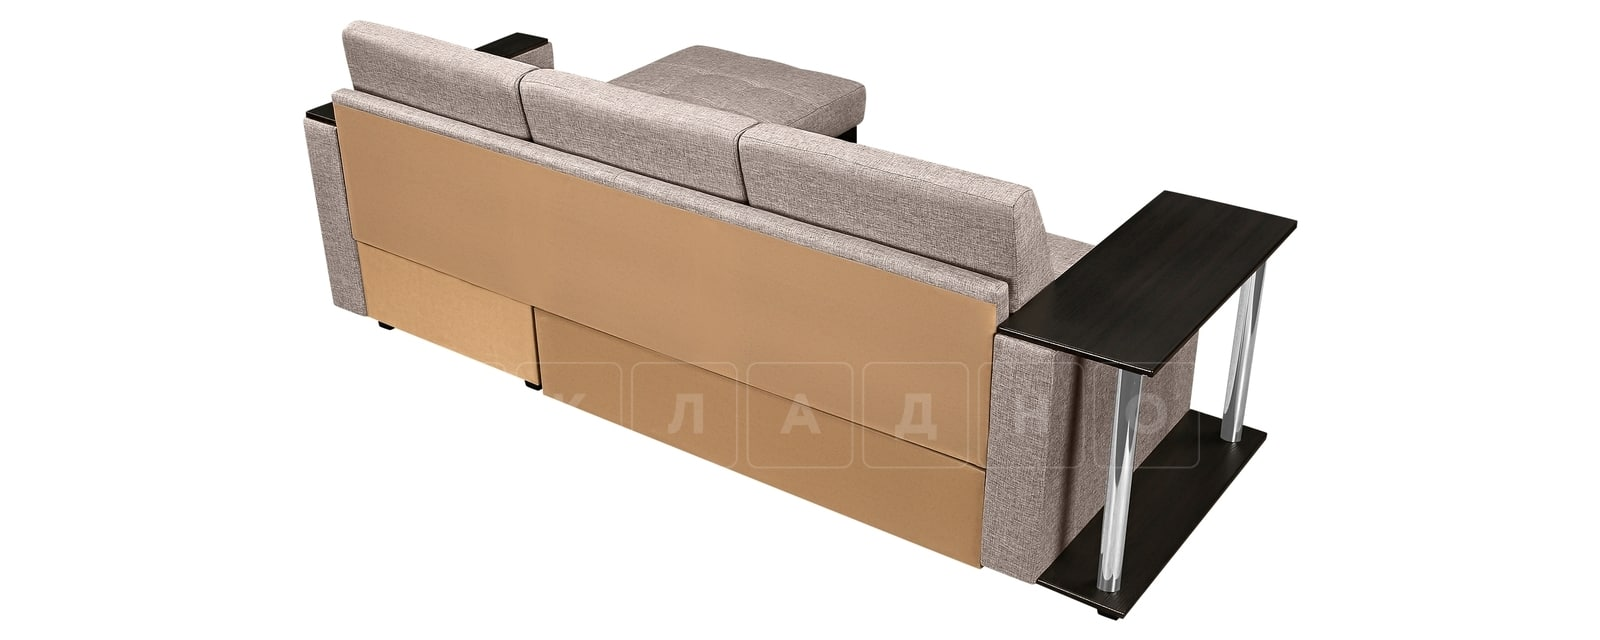 Угловой диван Атланта рогожка темно-бежевого цвета фото 3 | интернет-магазин Складно